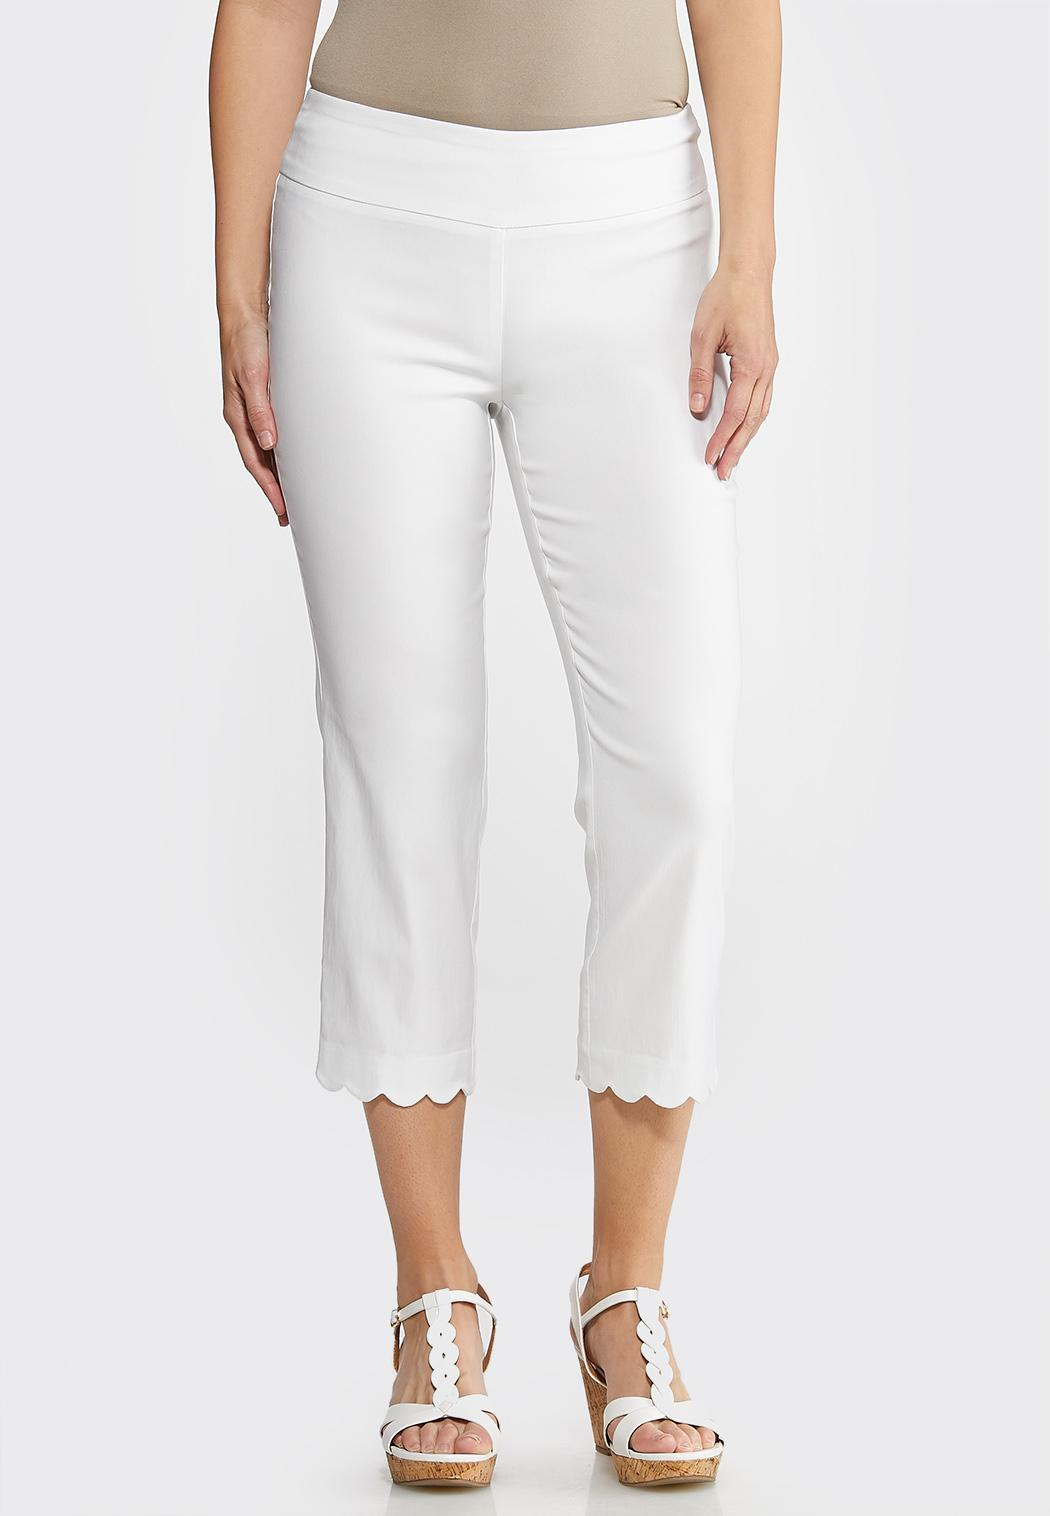 Cropped Scalloped Hem Pants